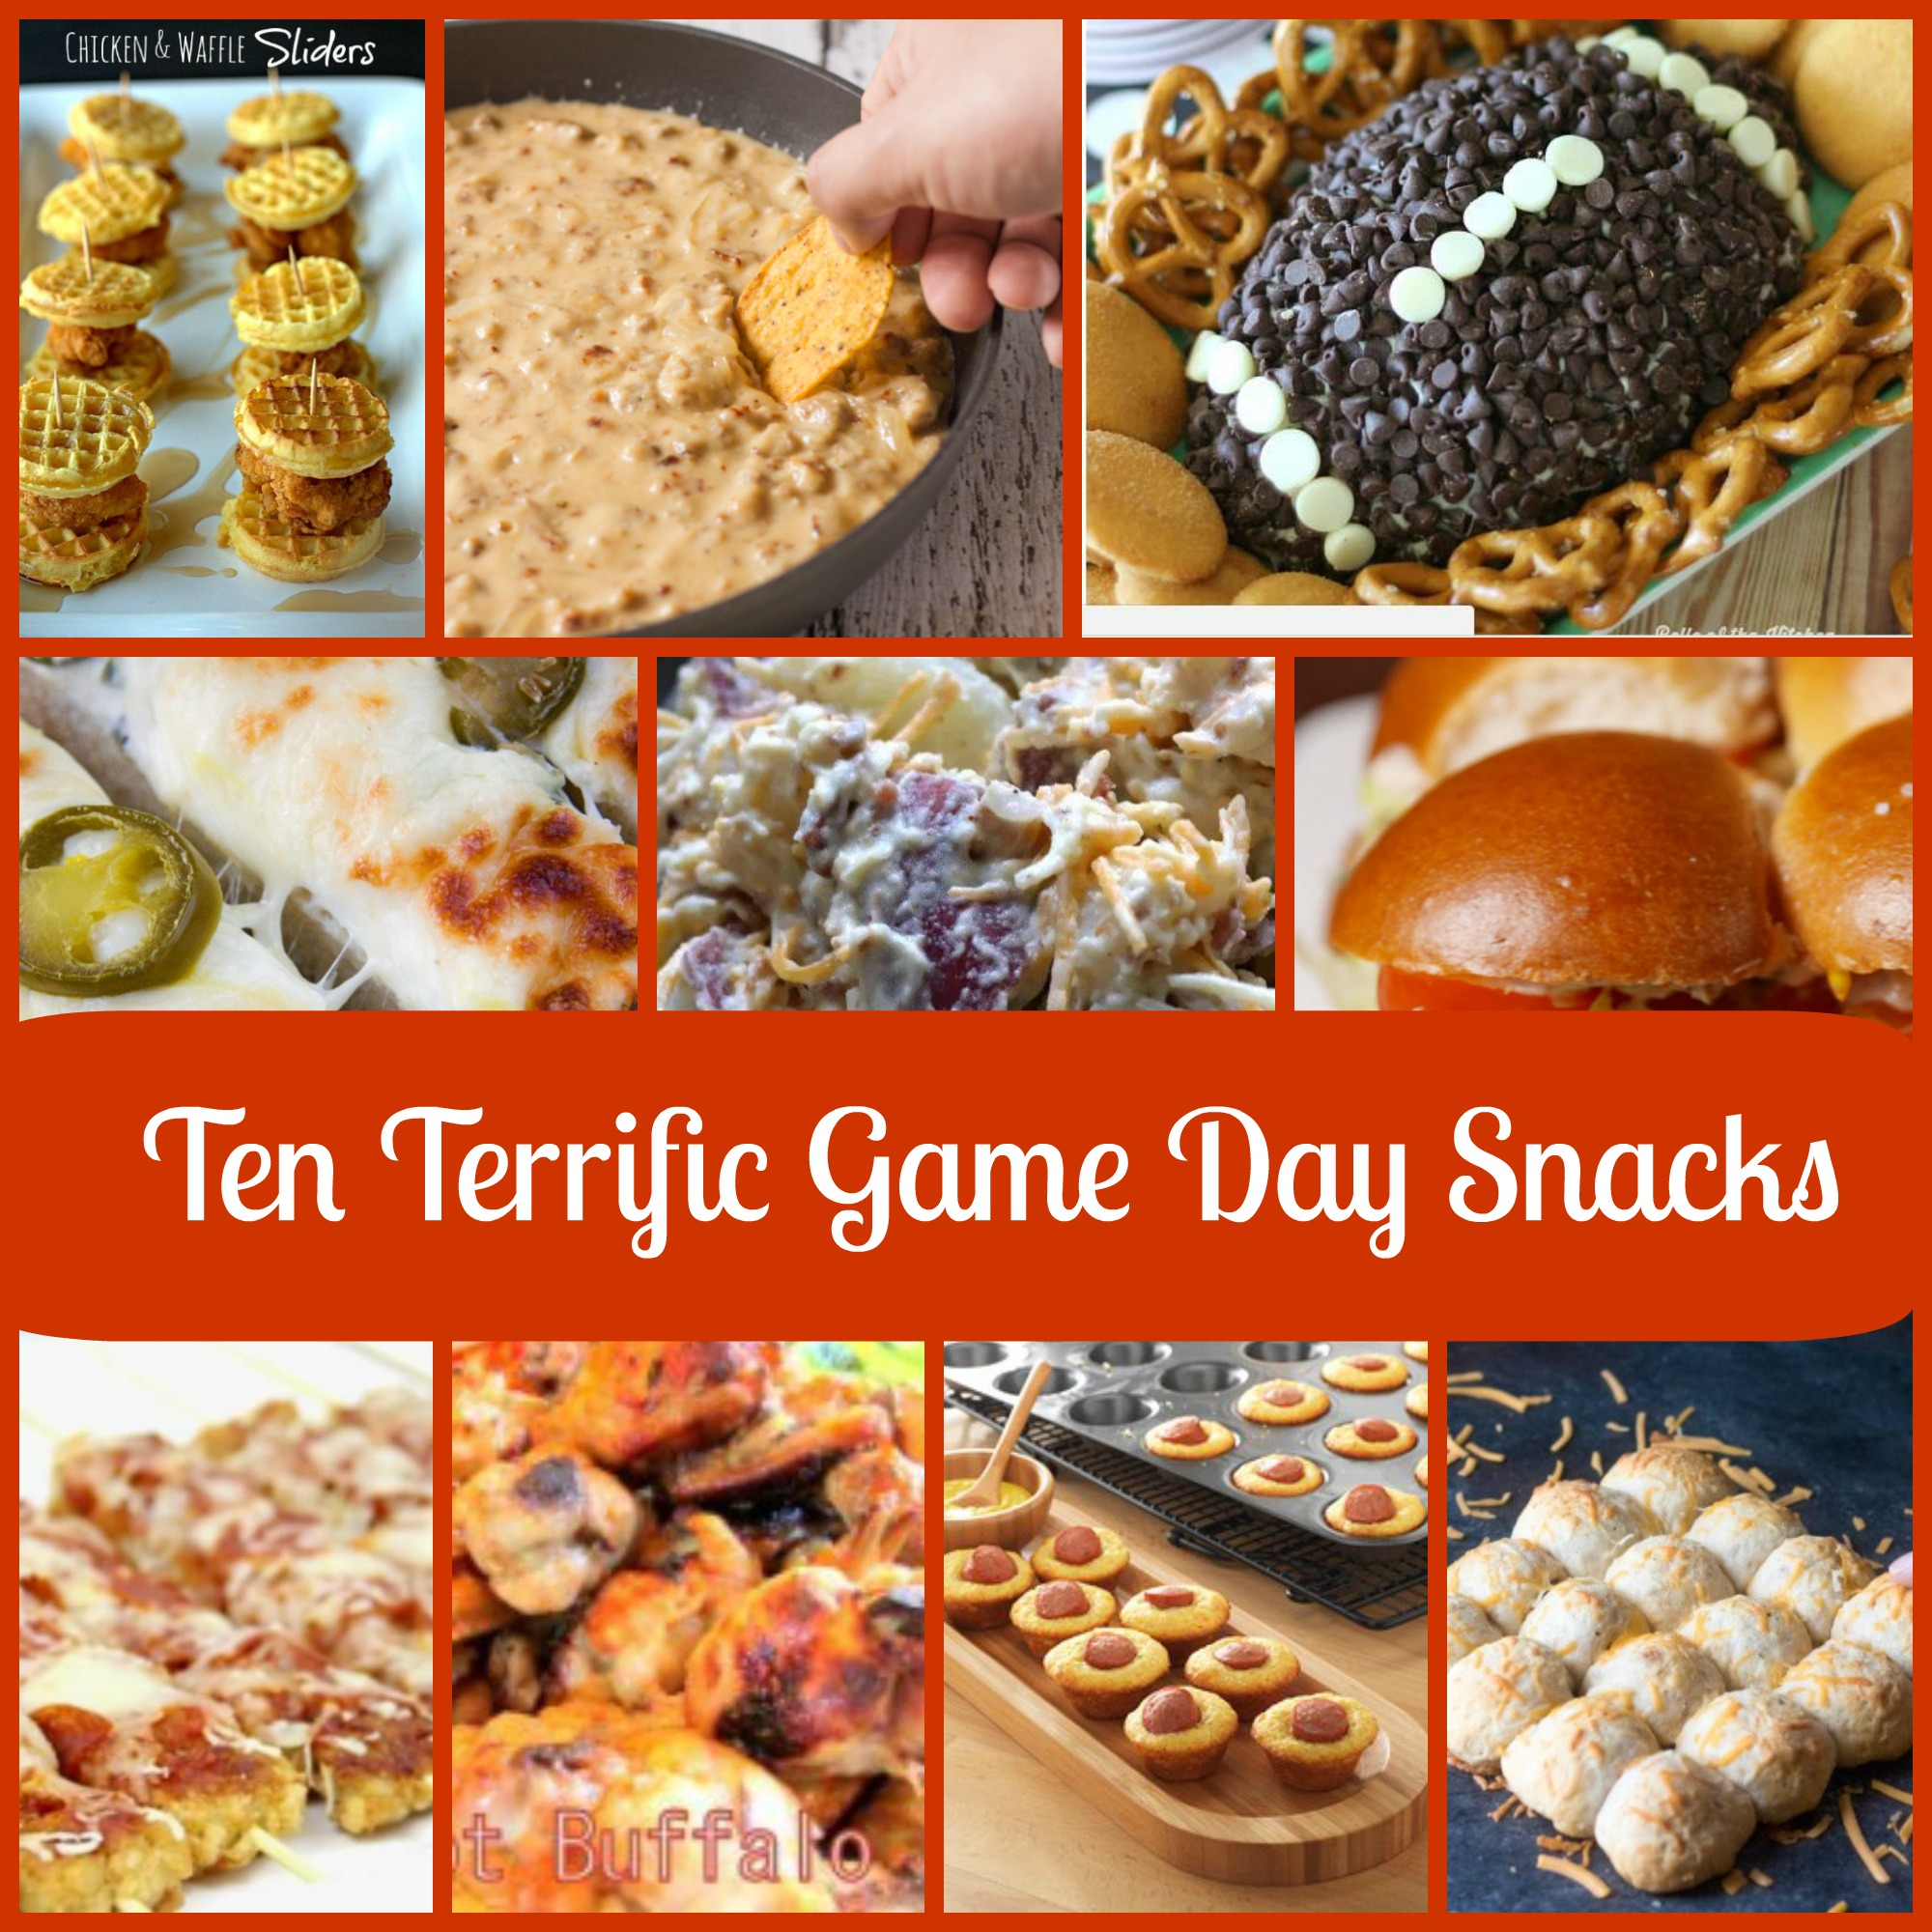 Ten Terrific Game Day Snack Recipes!!